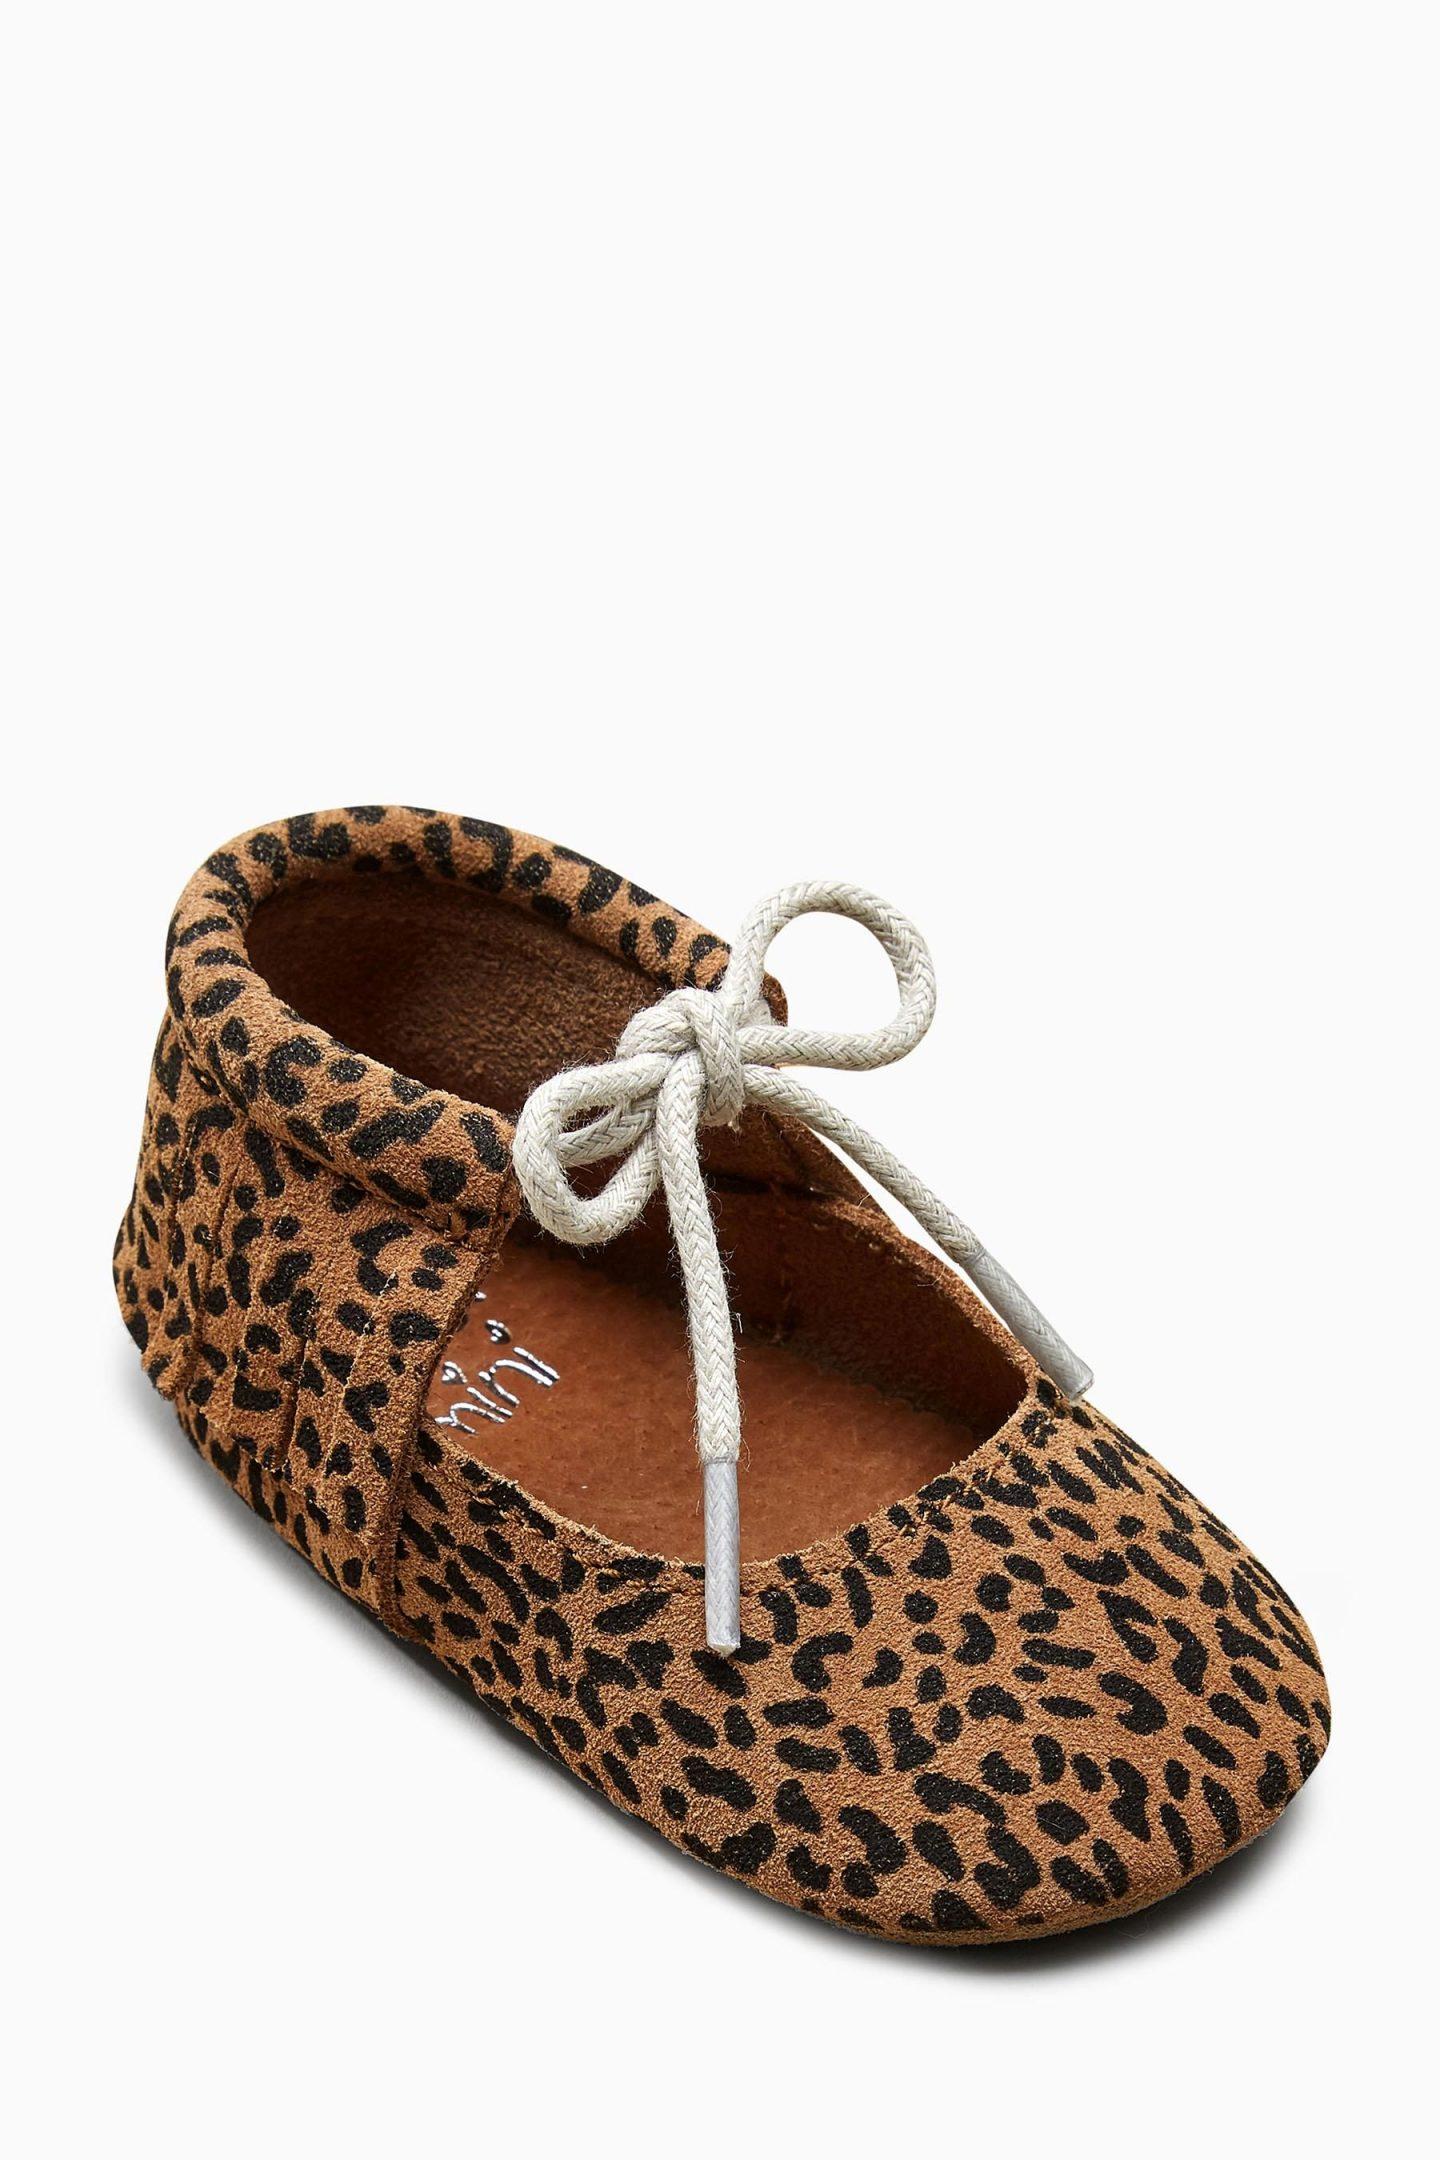 animal-print-pram-shoes